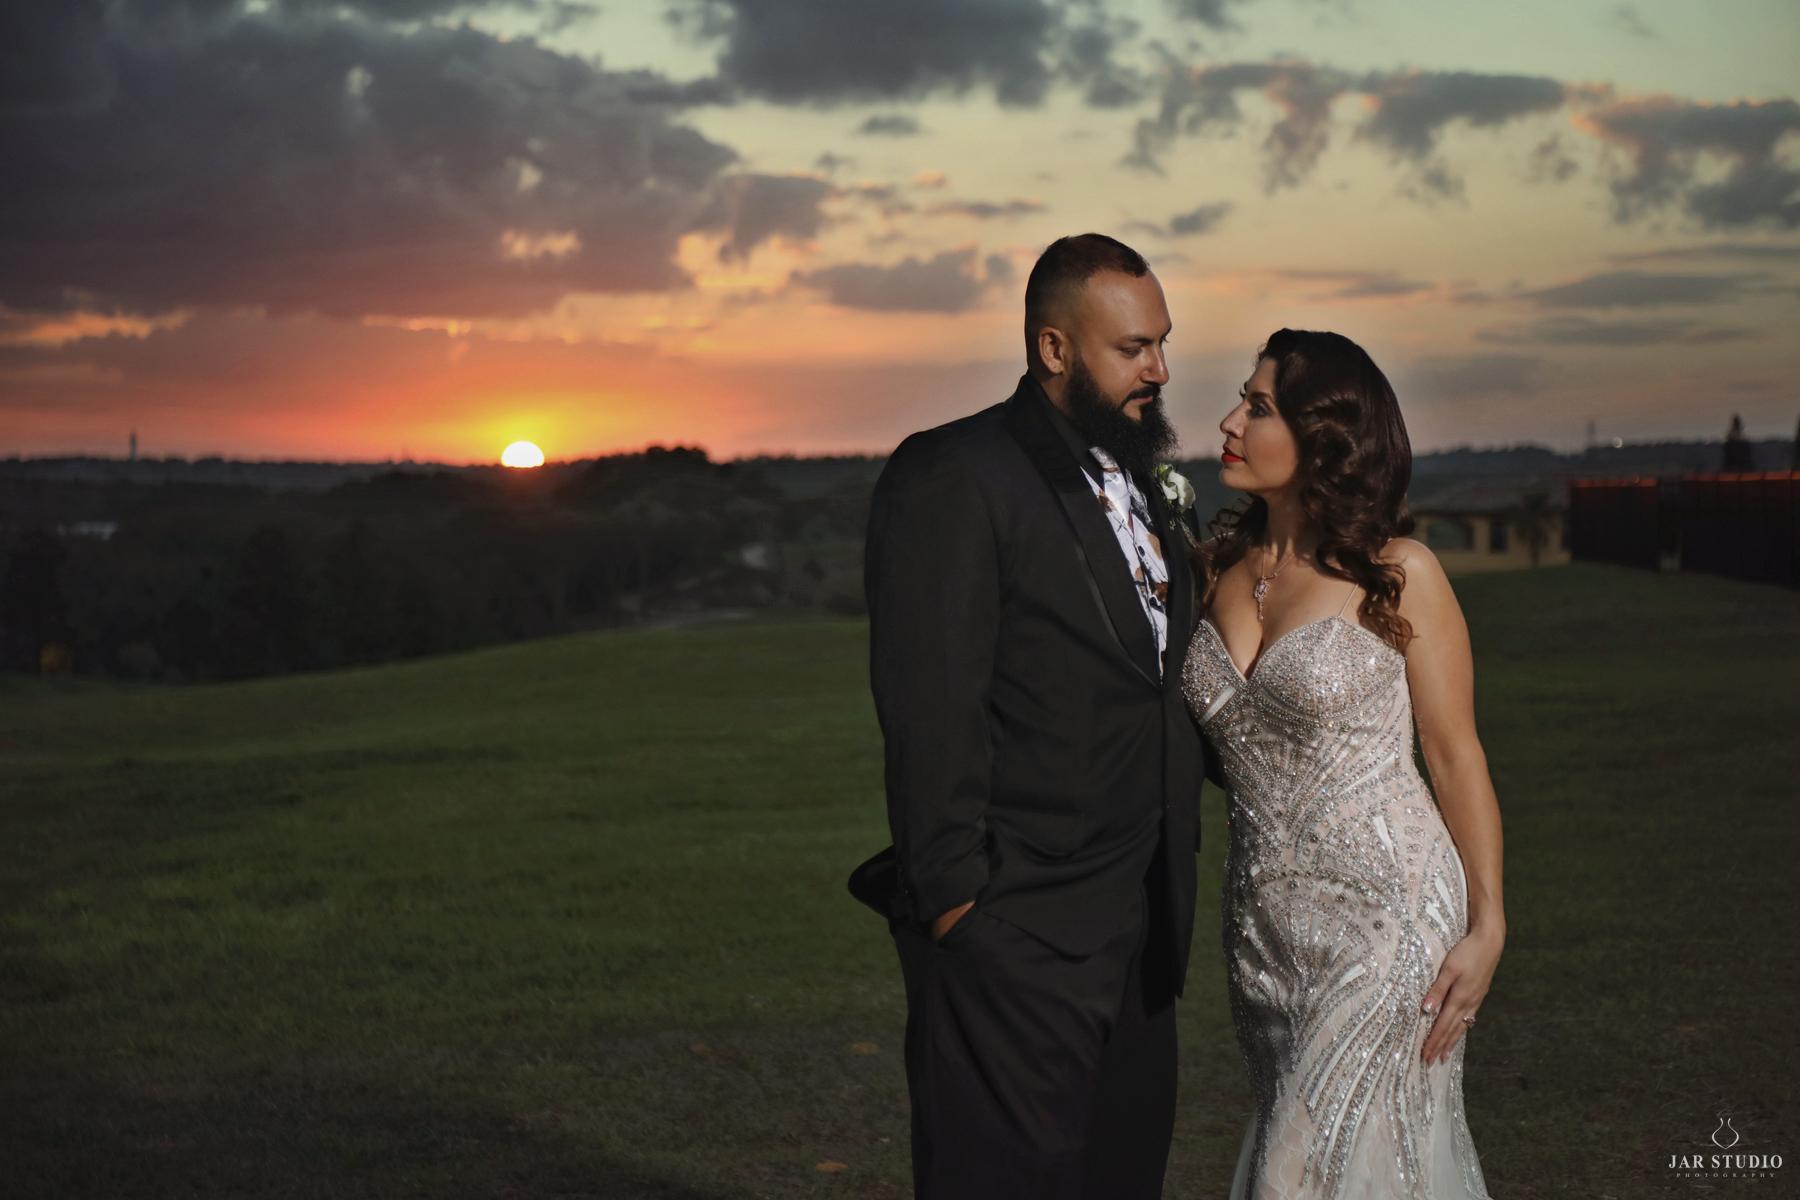 29-sunset-at-bella-collina-real-wedding-day-photos-jarstudio.jpg